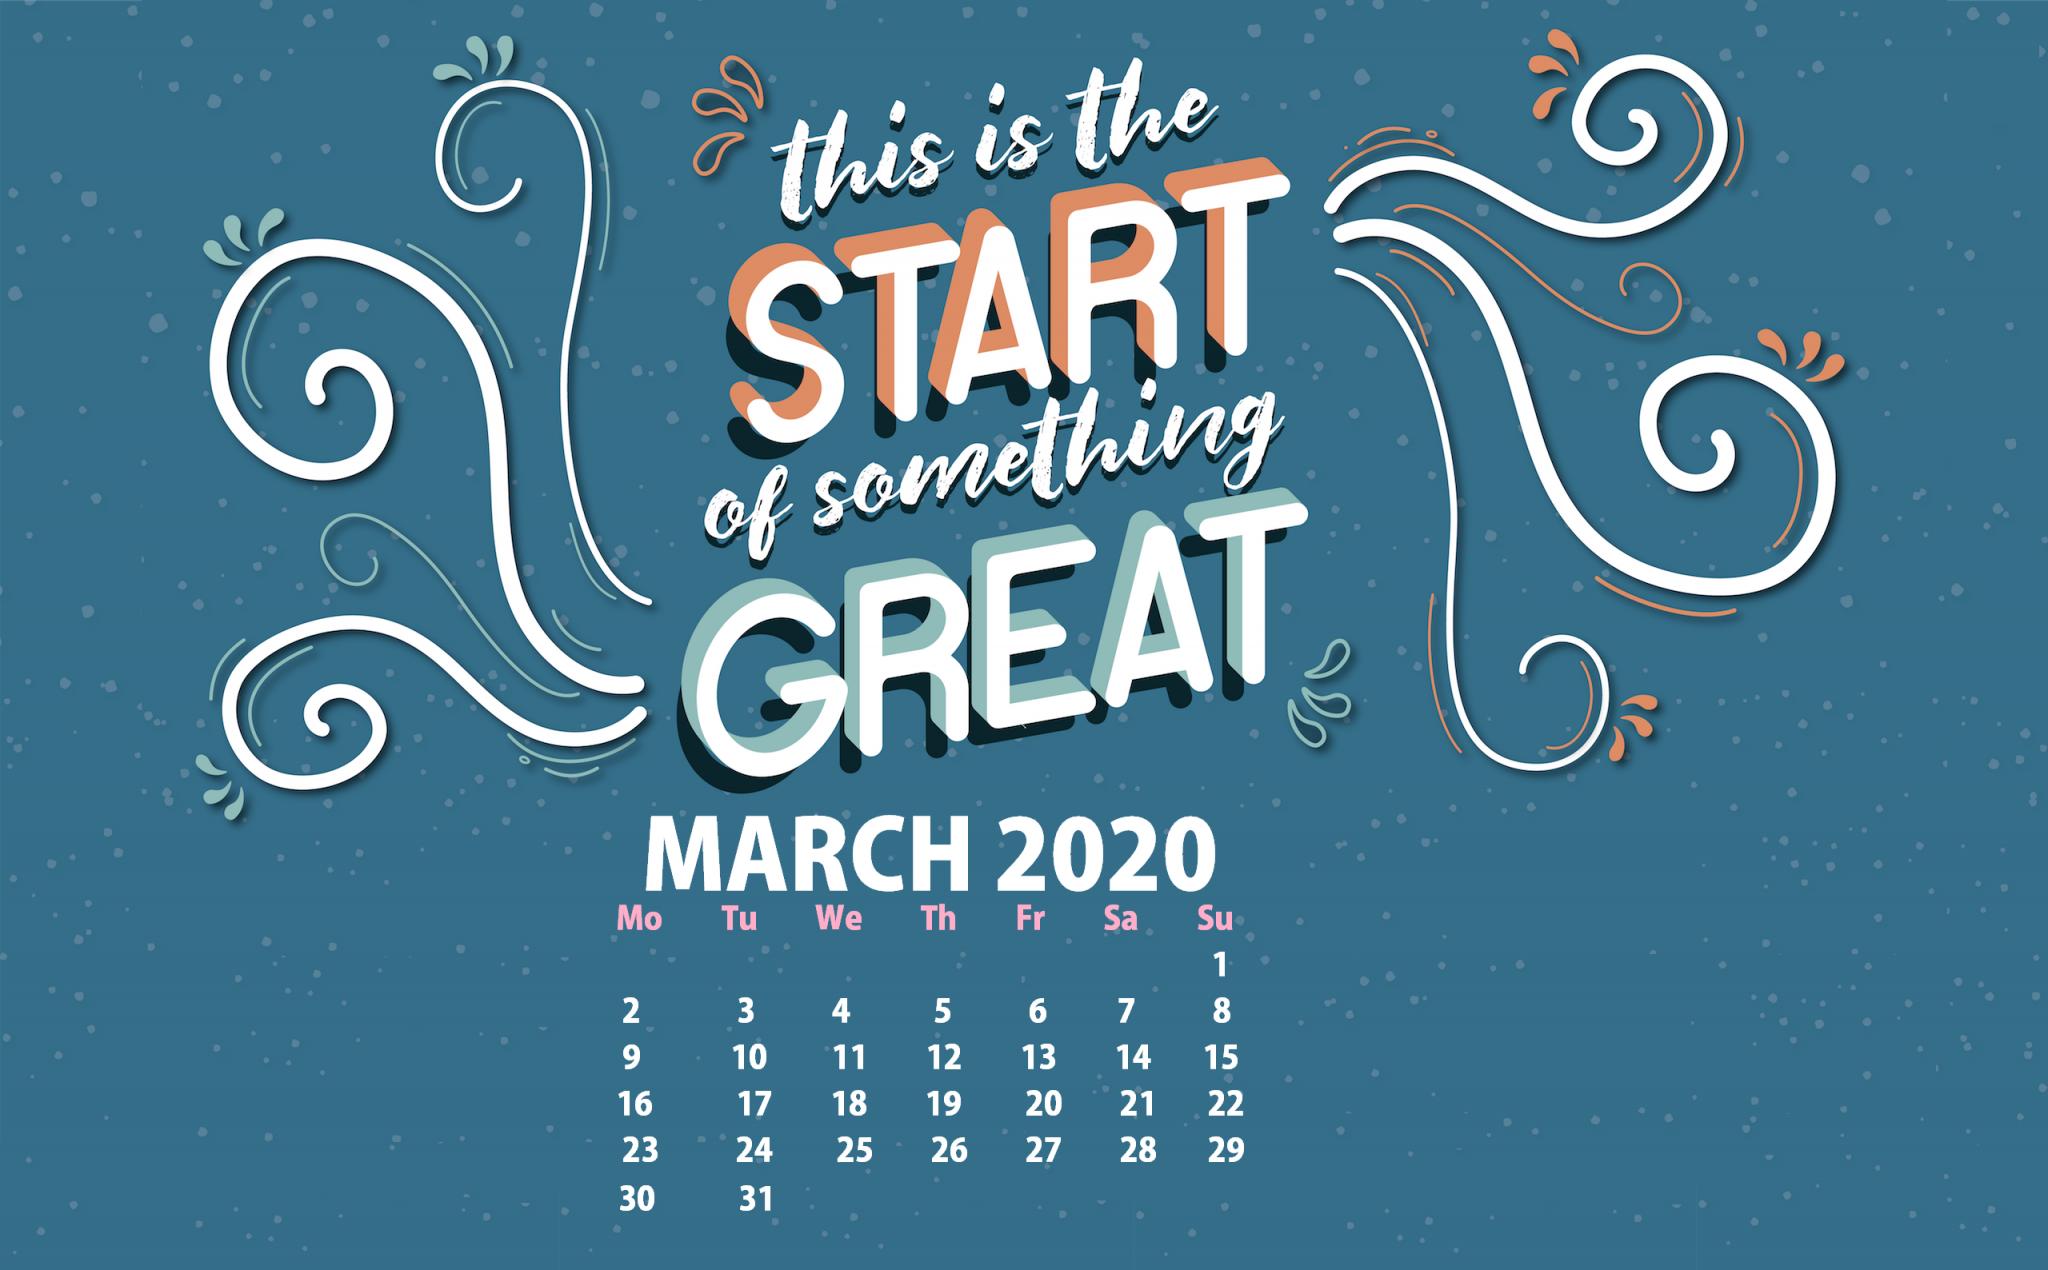 March 2020 Desktop Background